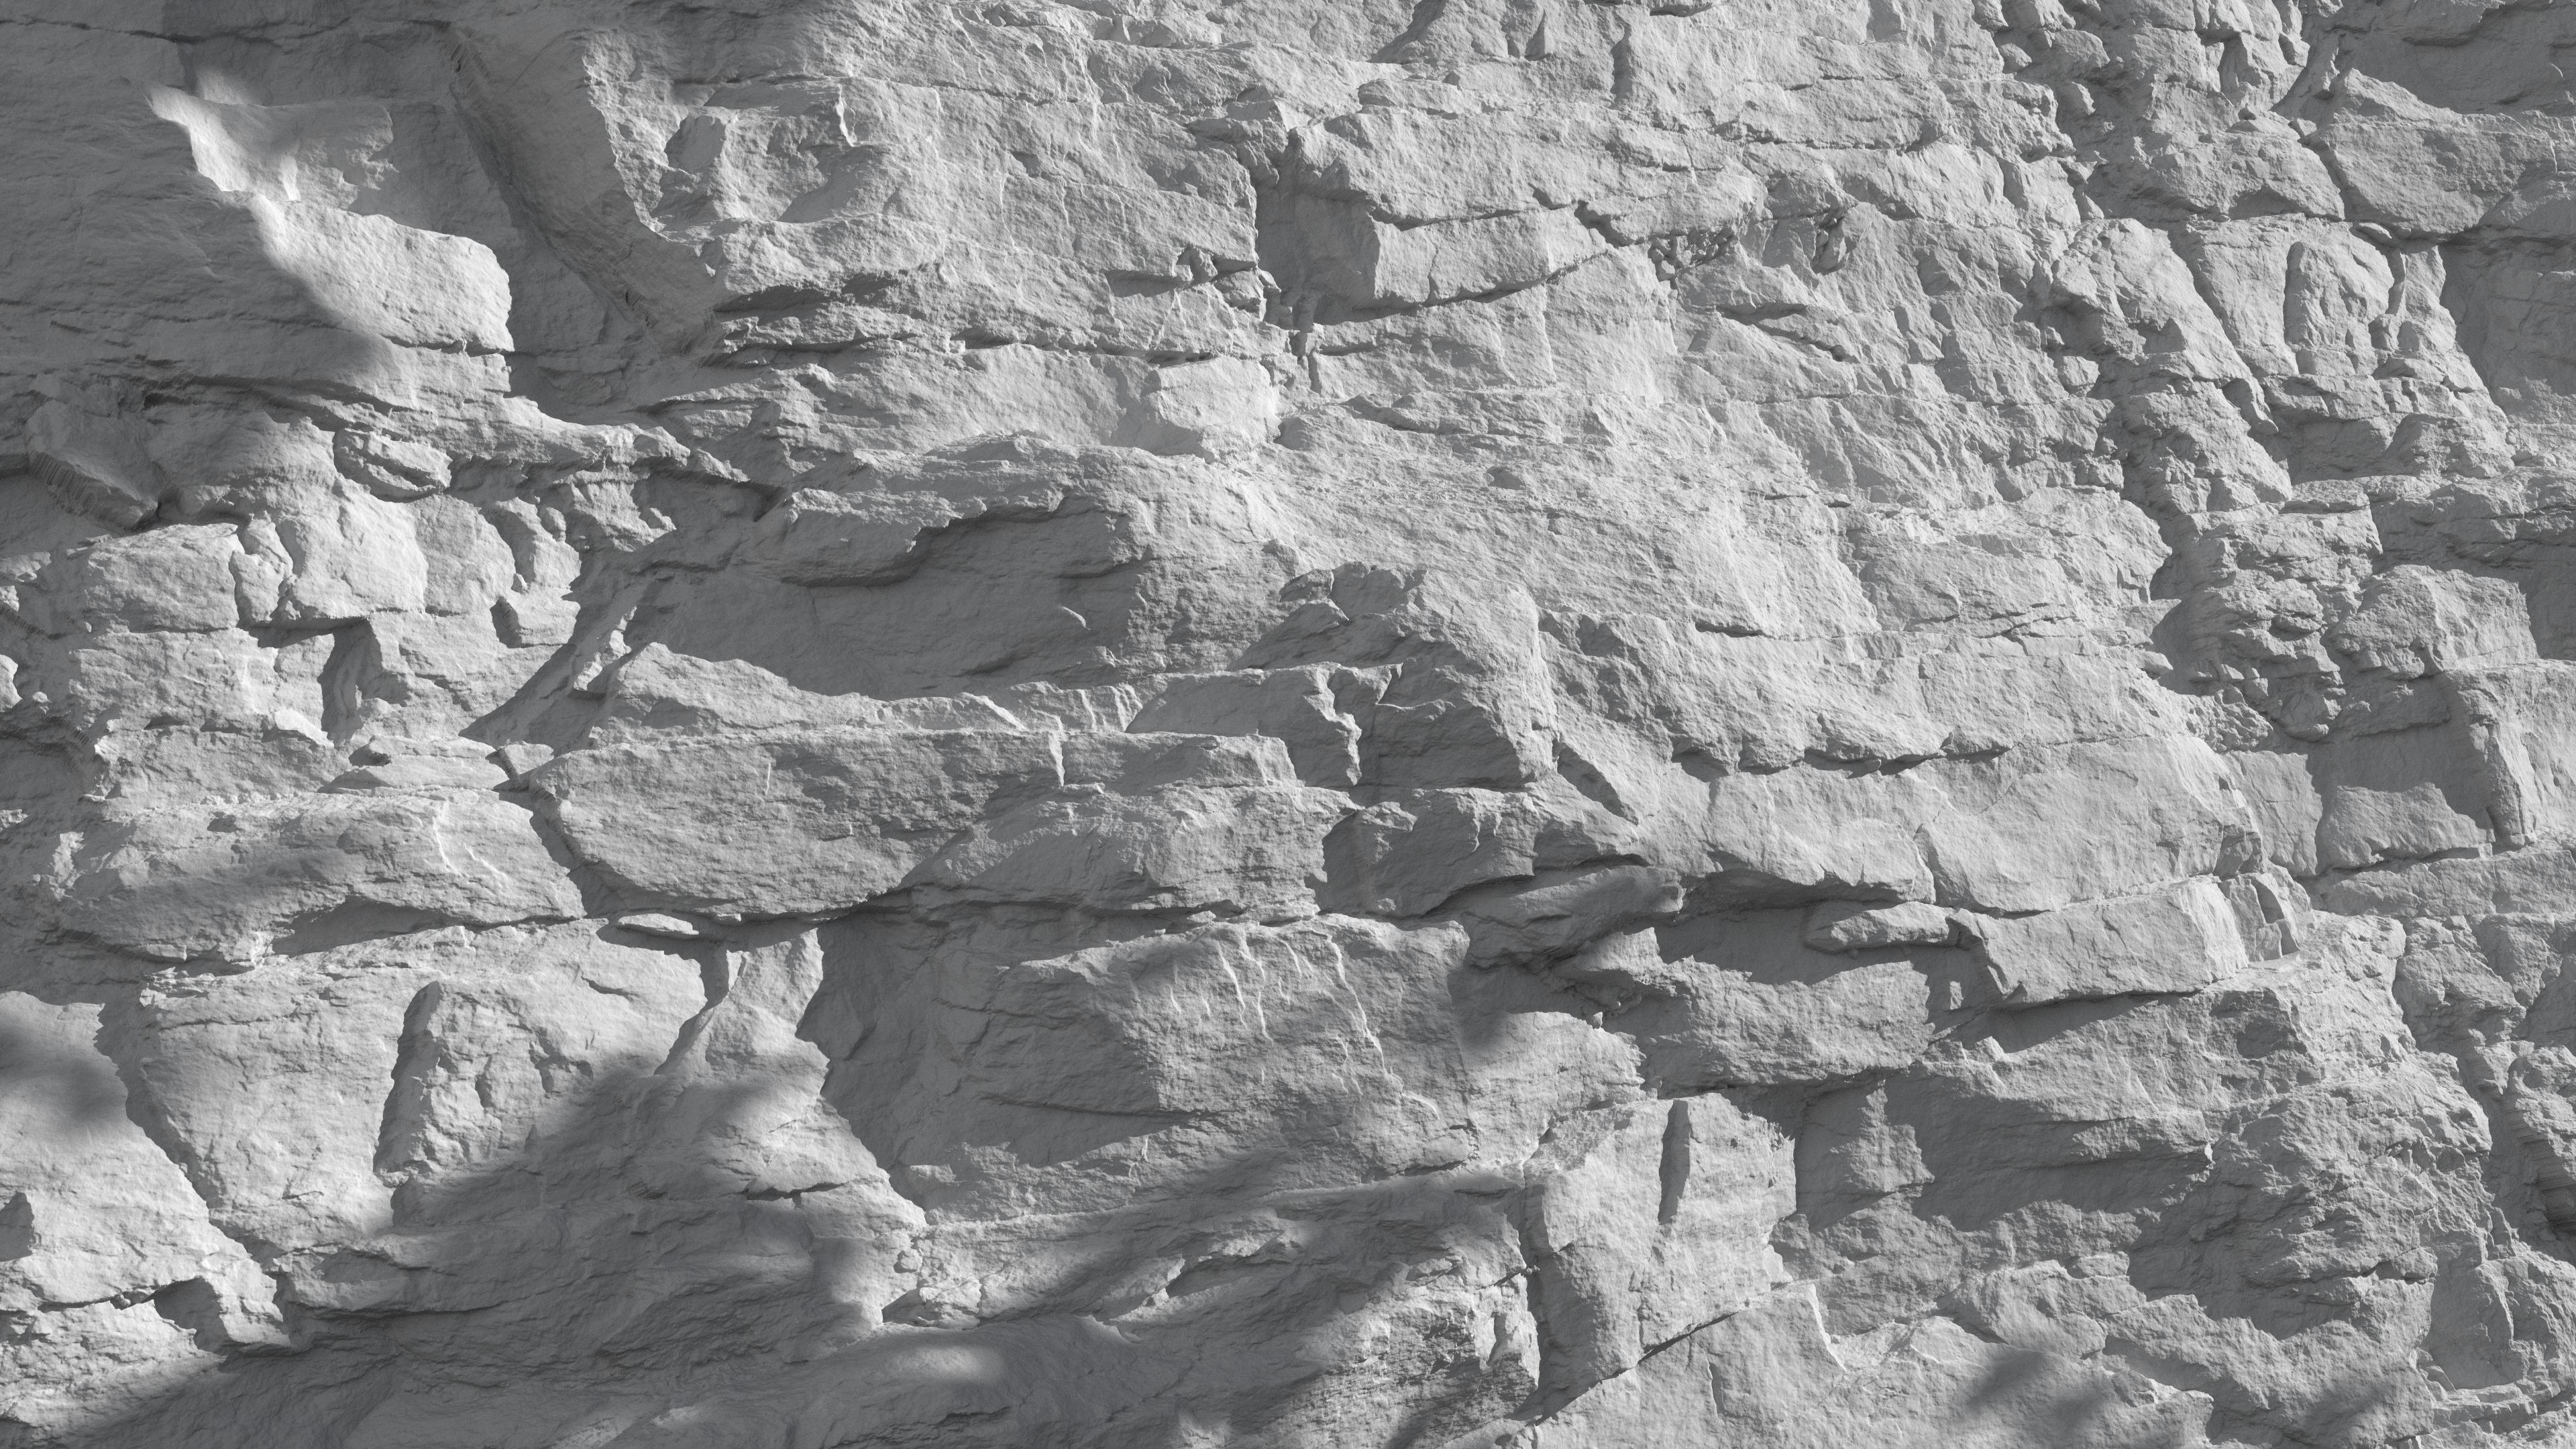 3d Scanned Cliff Rock 2x2 2x4 Meters